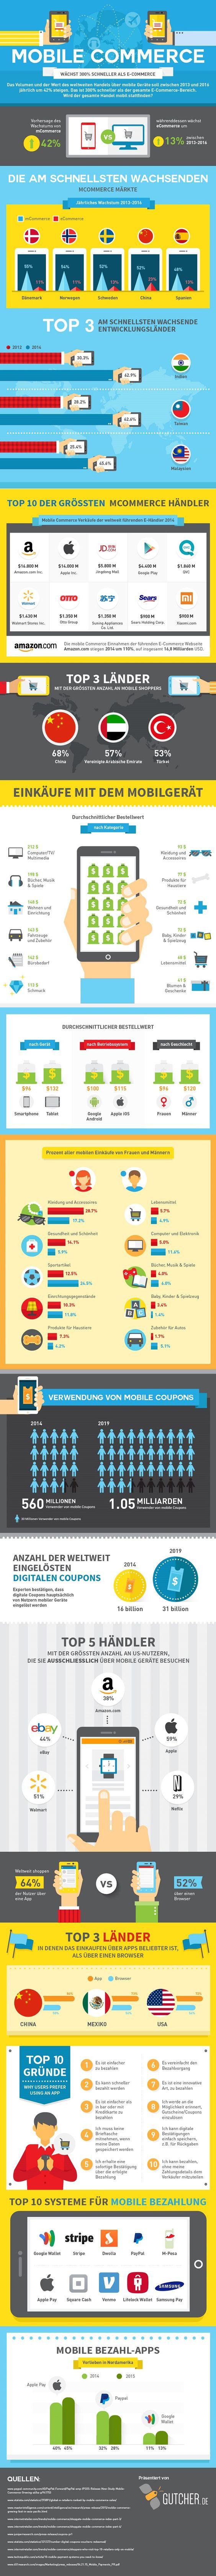 Mobiles - Infografik: Mobile Commerce wächst unaufhaltsam